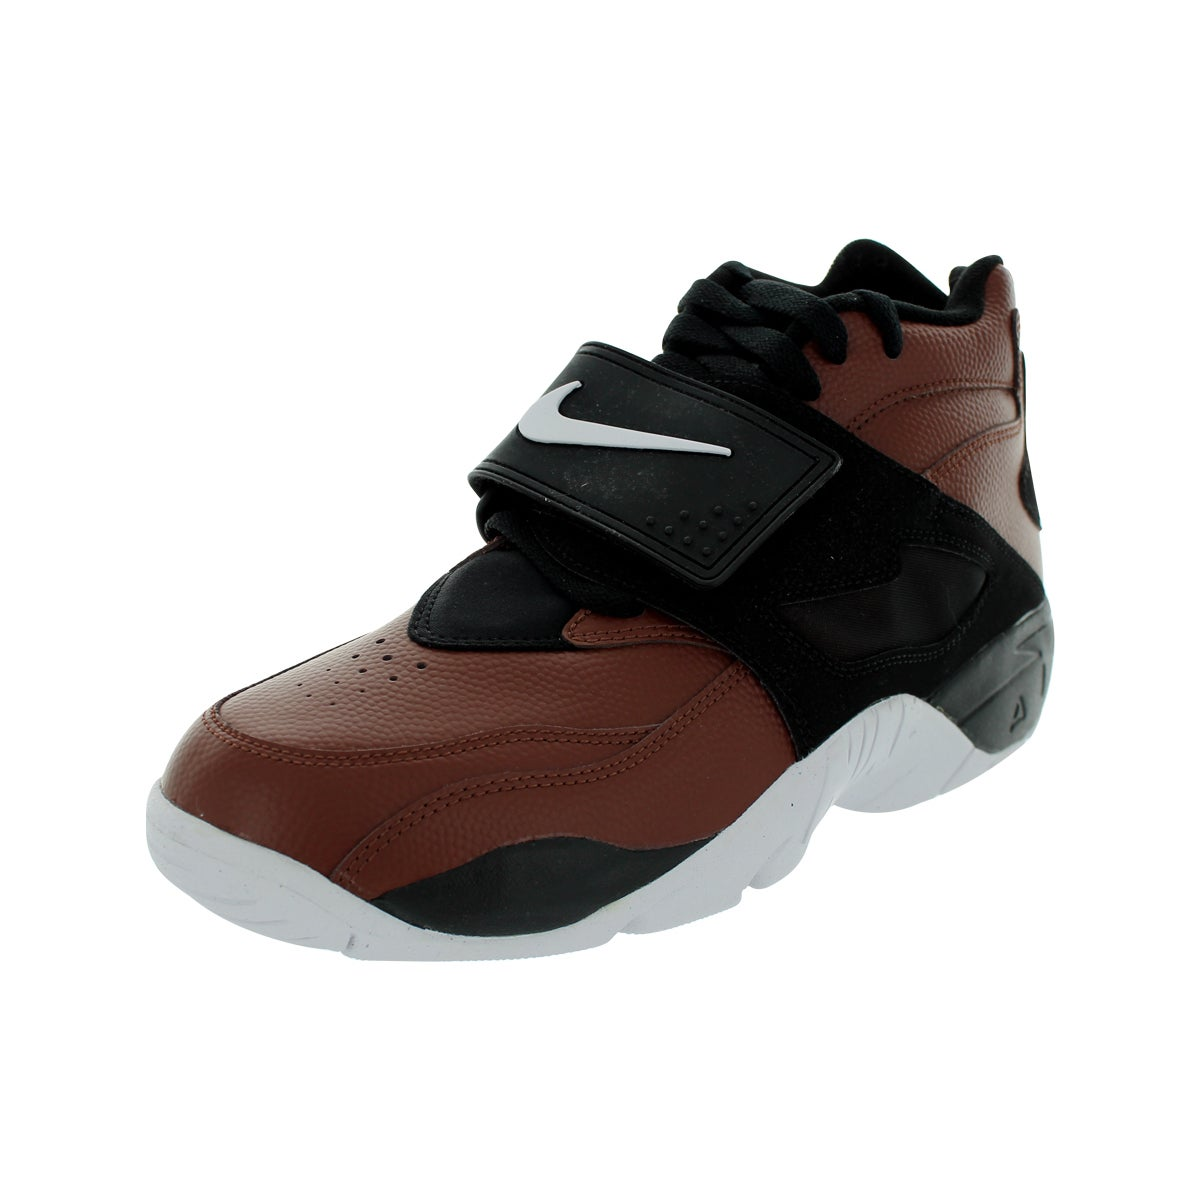 Nike Men's Air Diamond Turf Field Brown/White/Black Train...